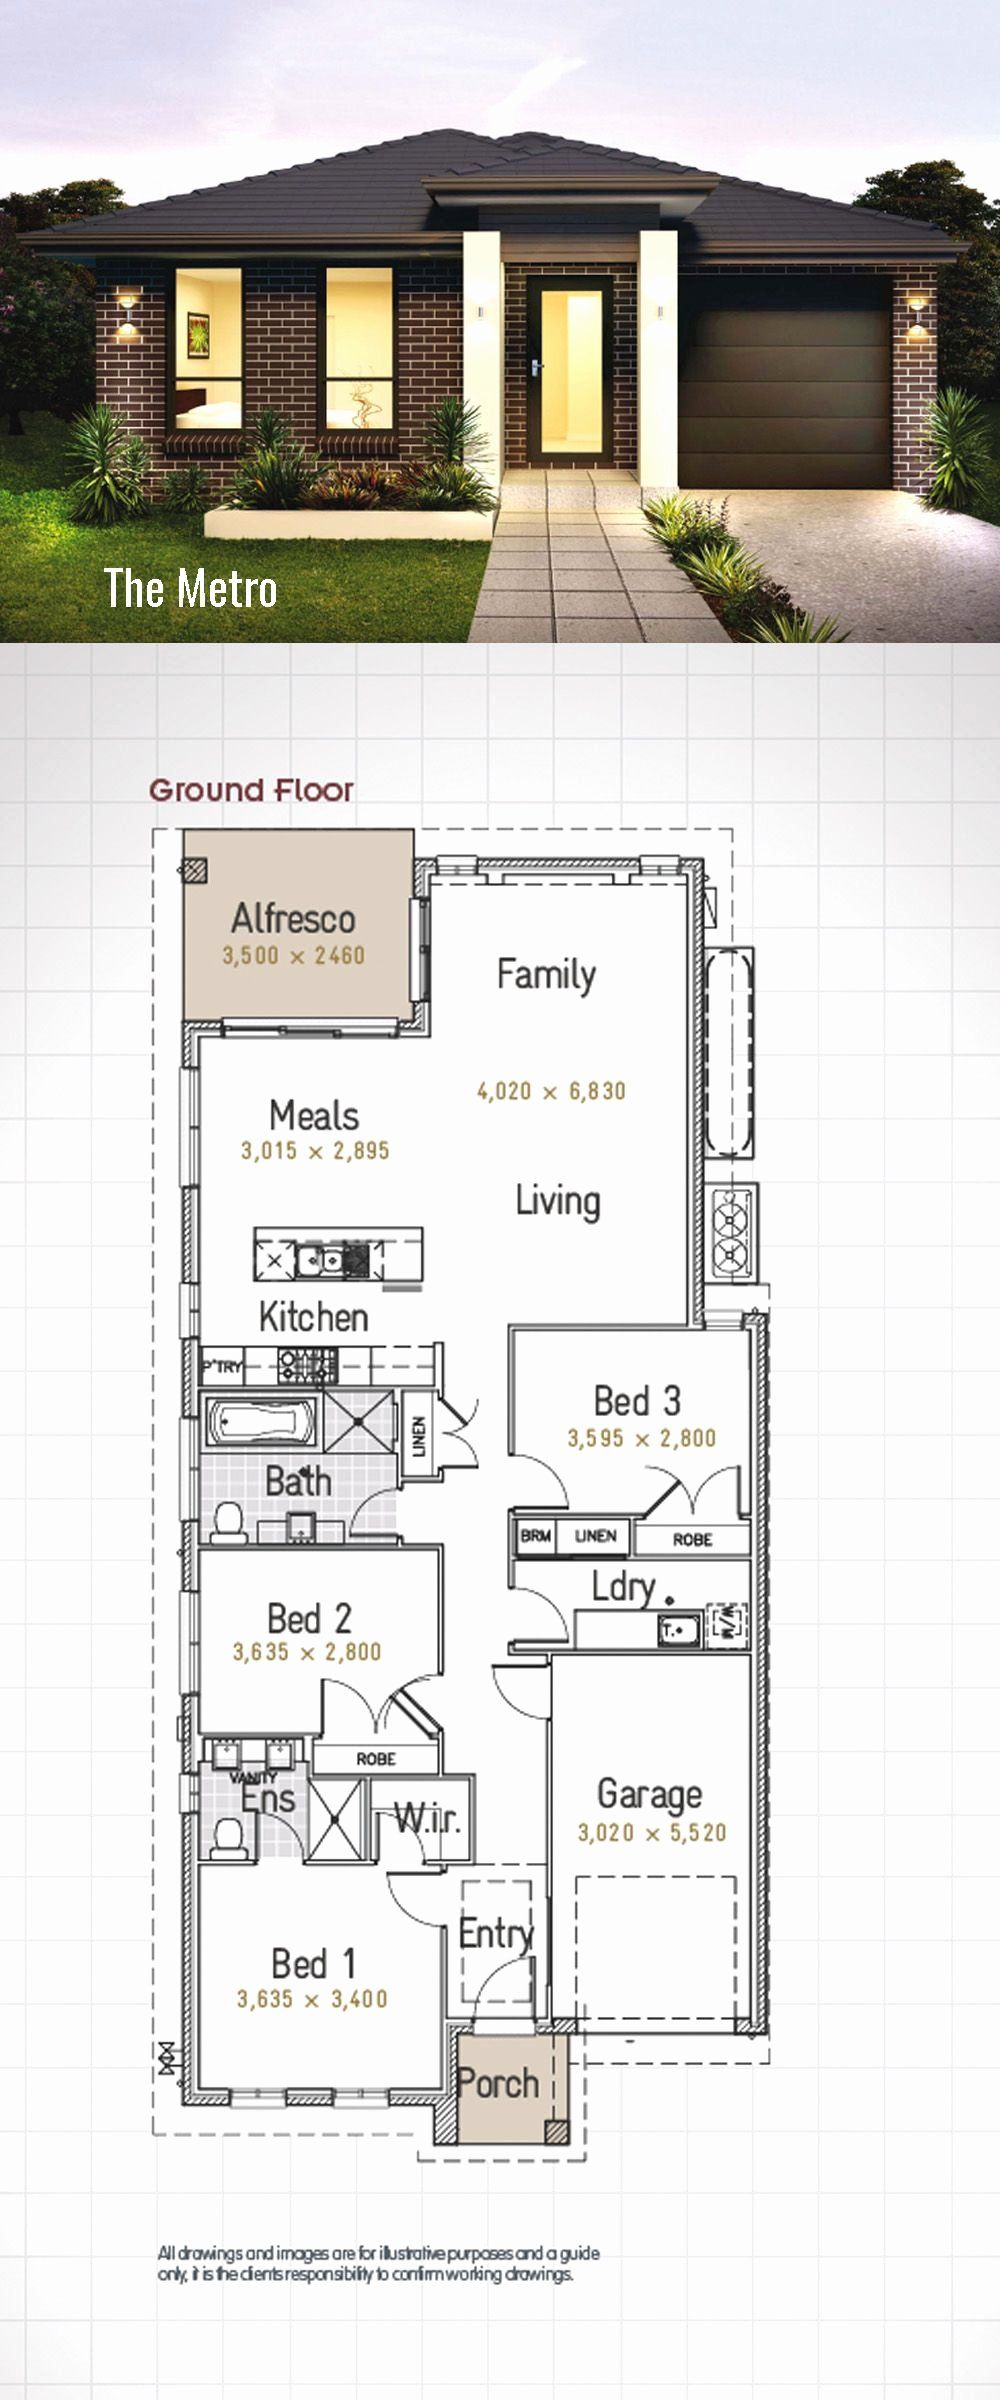 Open Floor Plans For Single Story Mediterranean Modern Homes 3394 Sq Ft With 3 Bedroom 4 Mediterranean Style House Plans Mediterranean Floor Plans House Plans